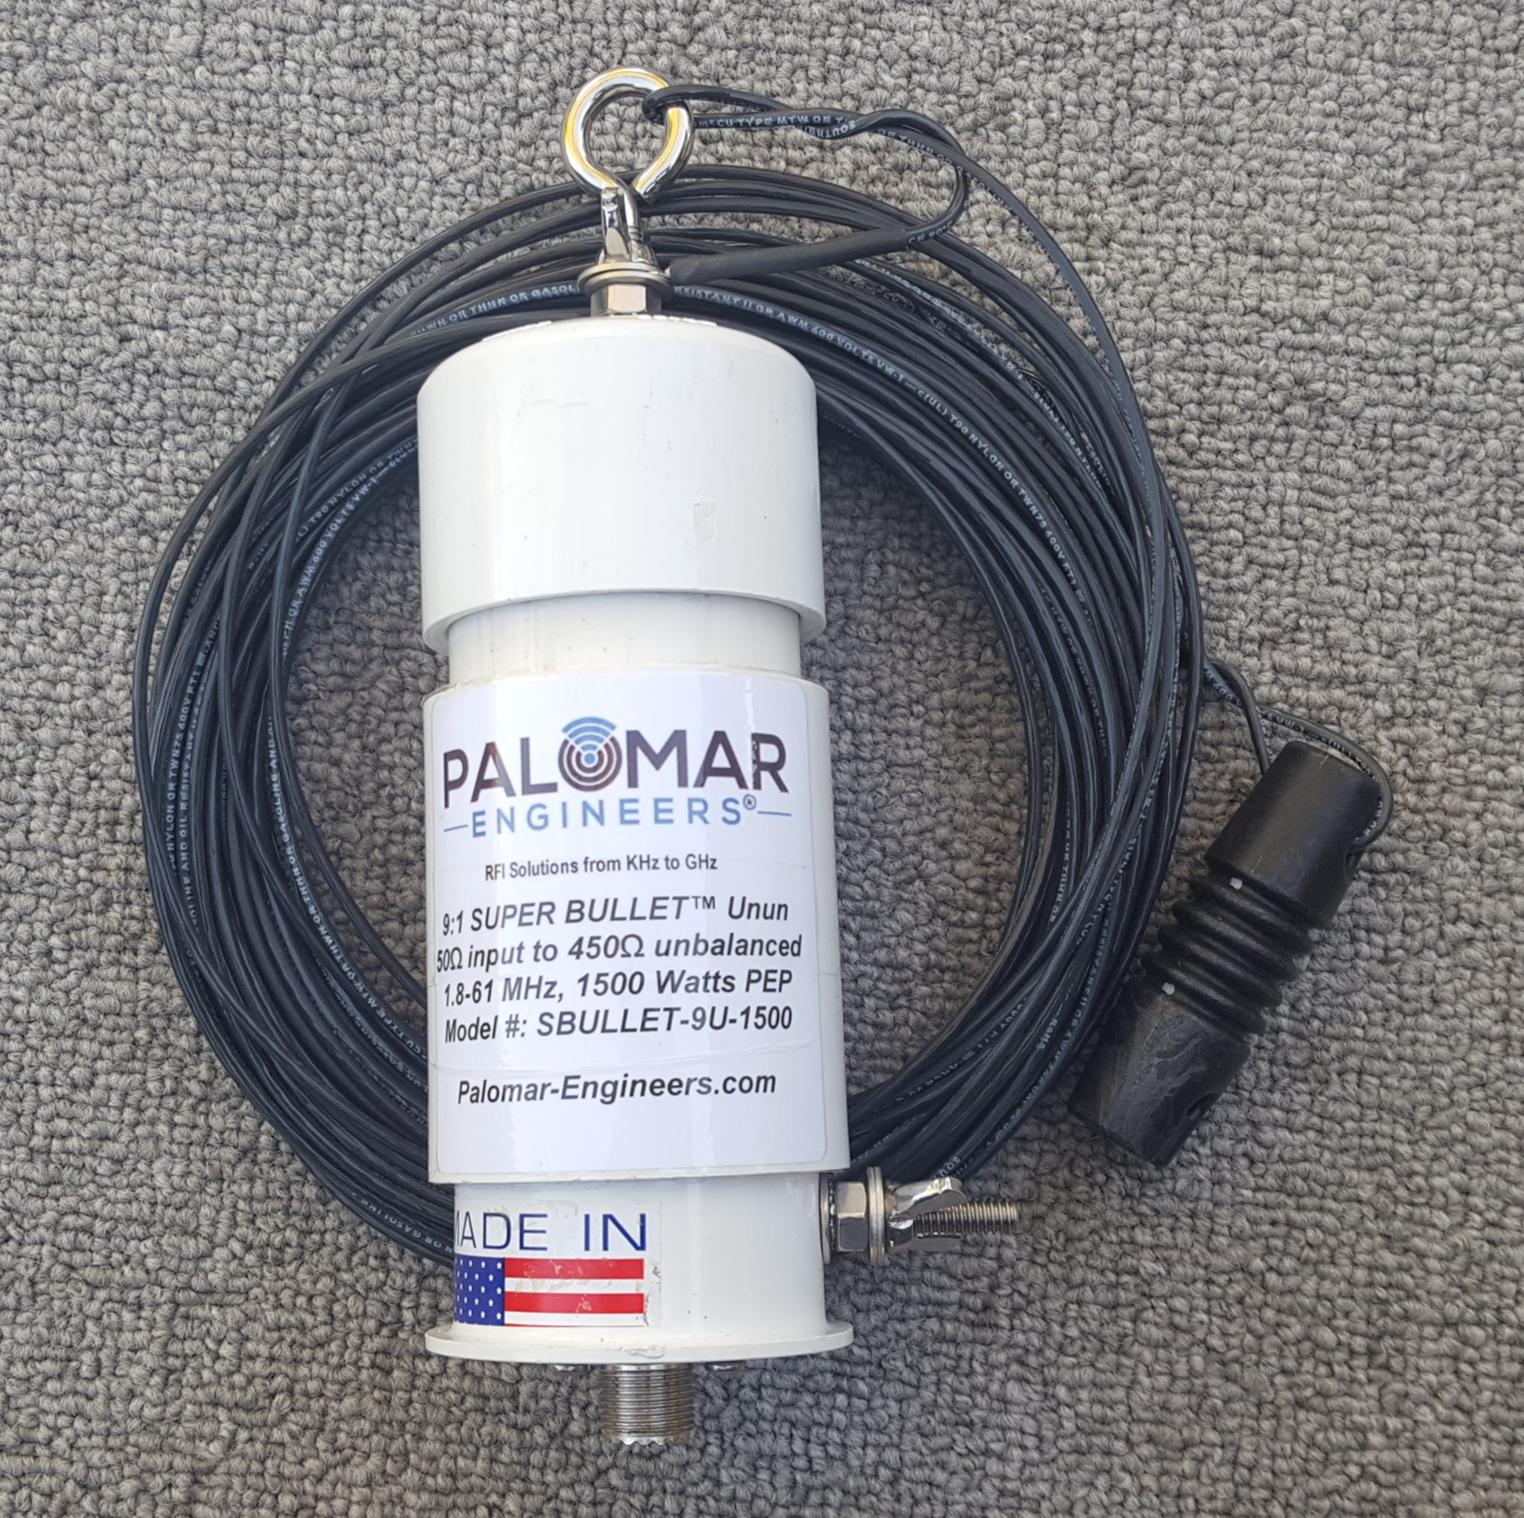 Bullet End Fed 500/1500 Watt Antenna (1.8-61 MHz) - 55-203 FT